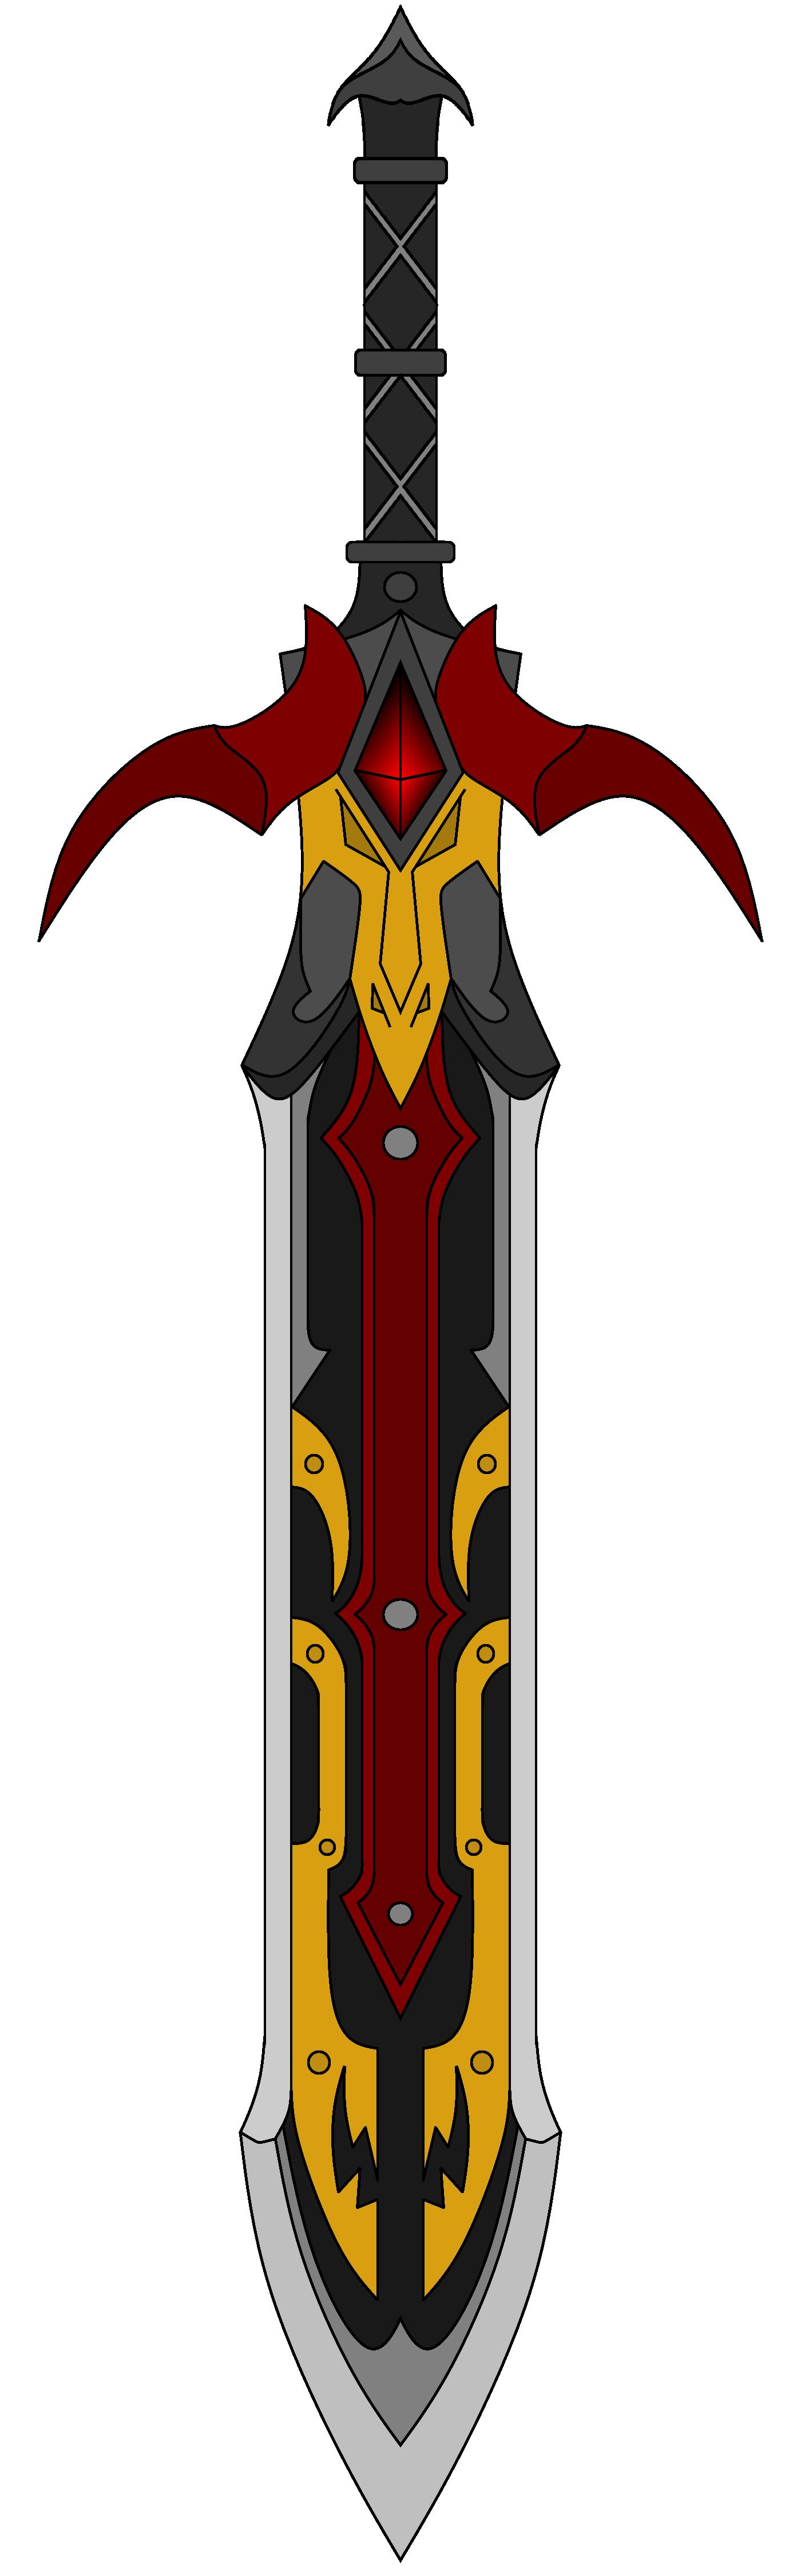 Sword of the dragon. Dagger clipart thin